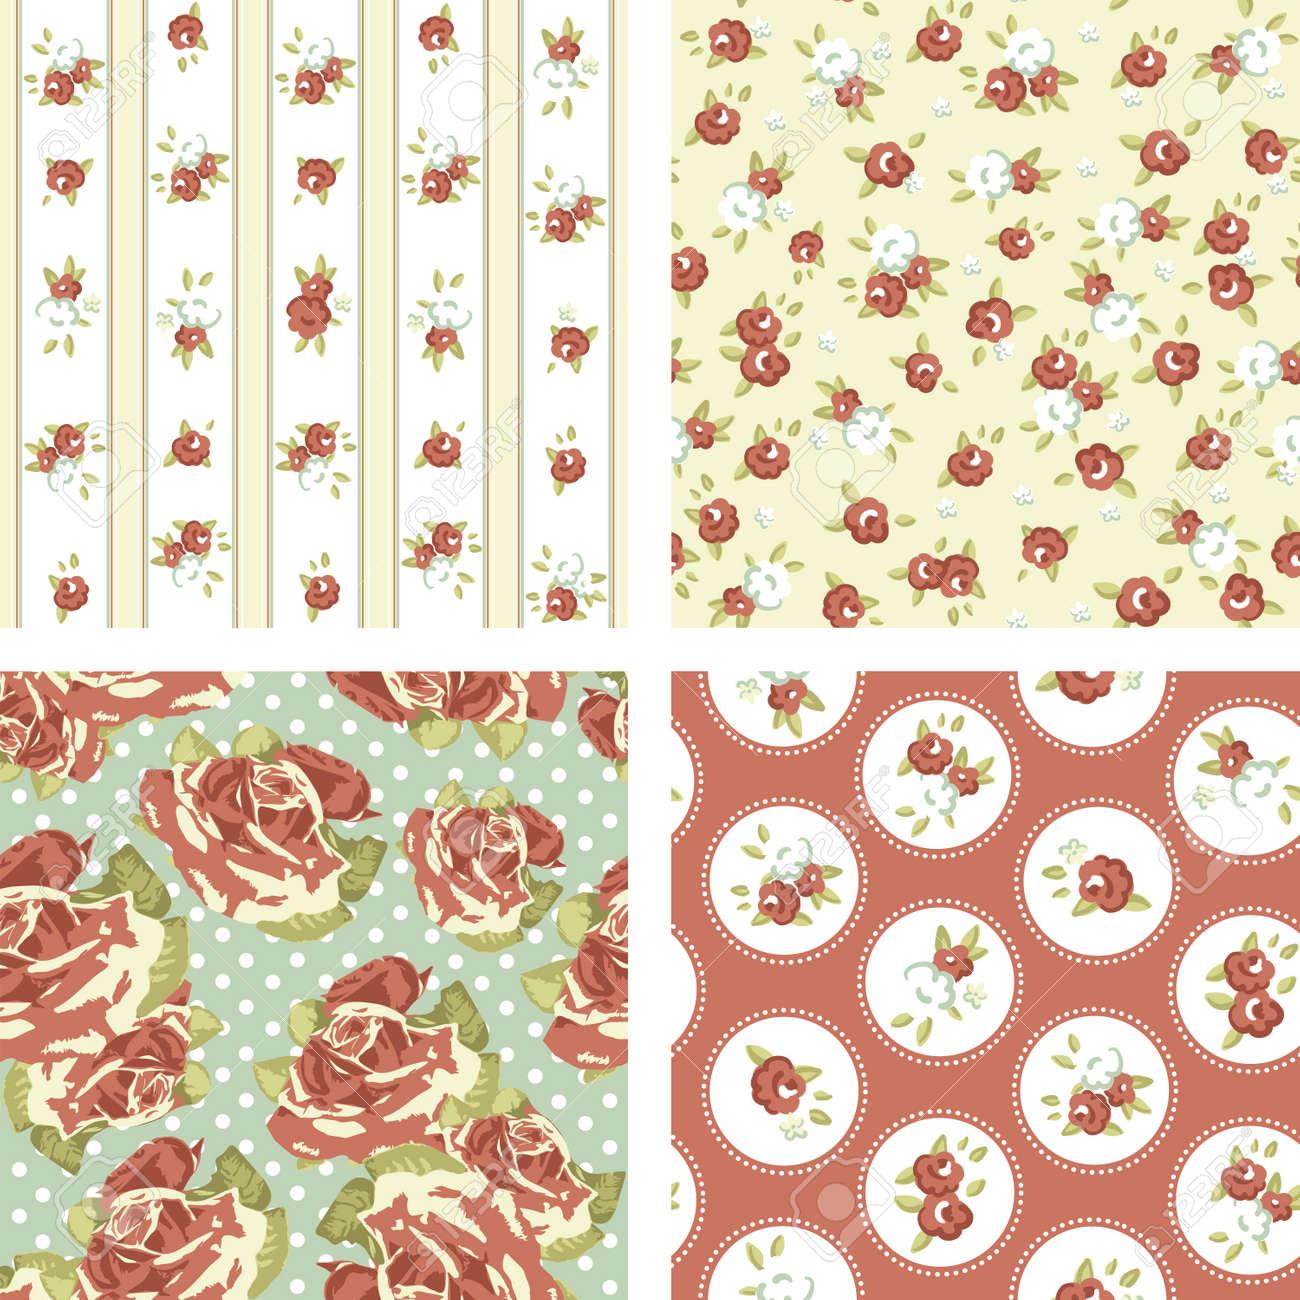 Shabby Chic Set 4 Vintage Rose Patterns Seamless Wallpaper Stock Vector